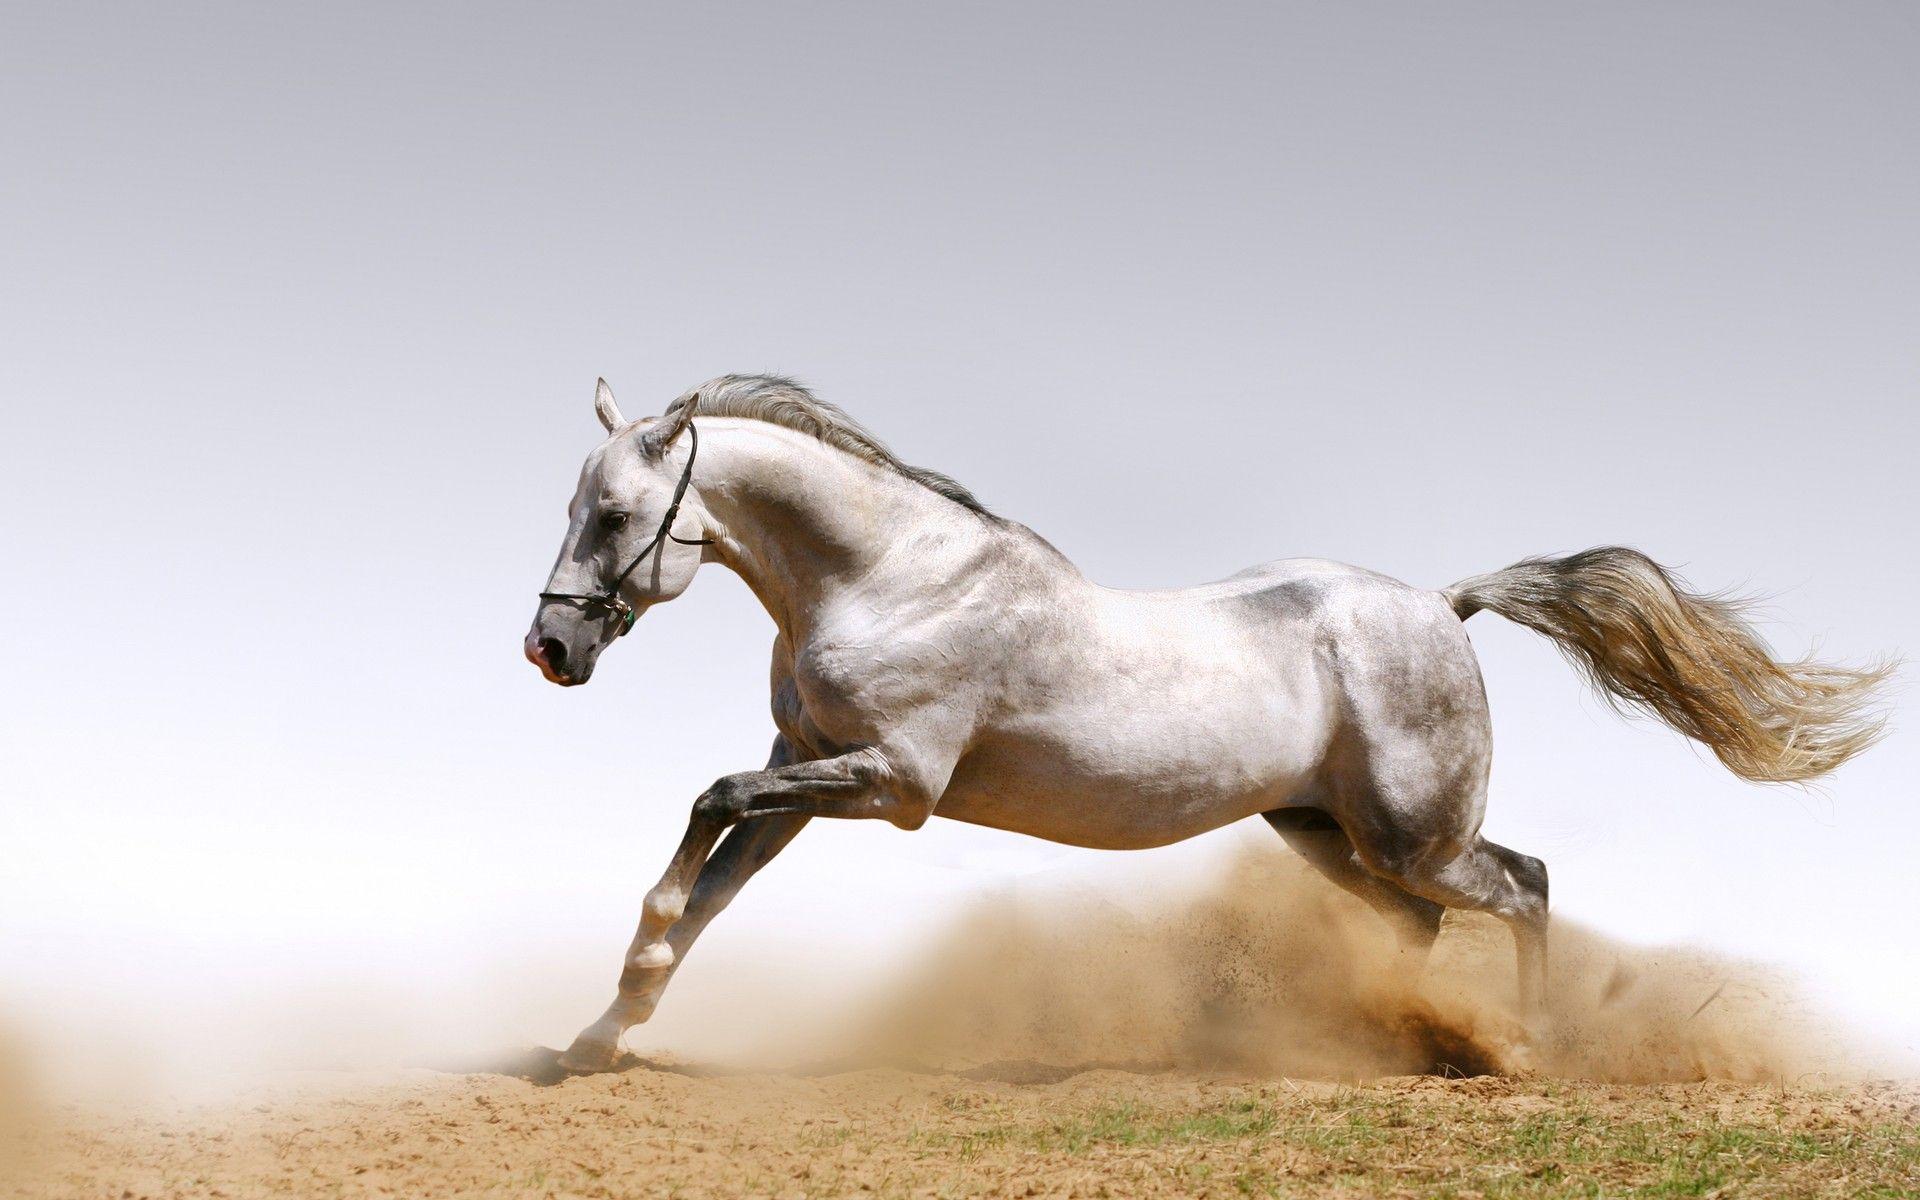 Beautiful Wallpaper Horse Desktop Background - 515d8a65ff99ac9d6cacff739457ed46  You Should Have_485685.jpg